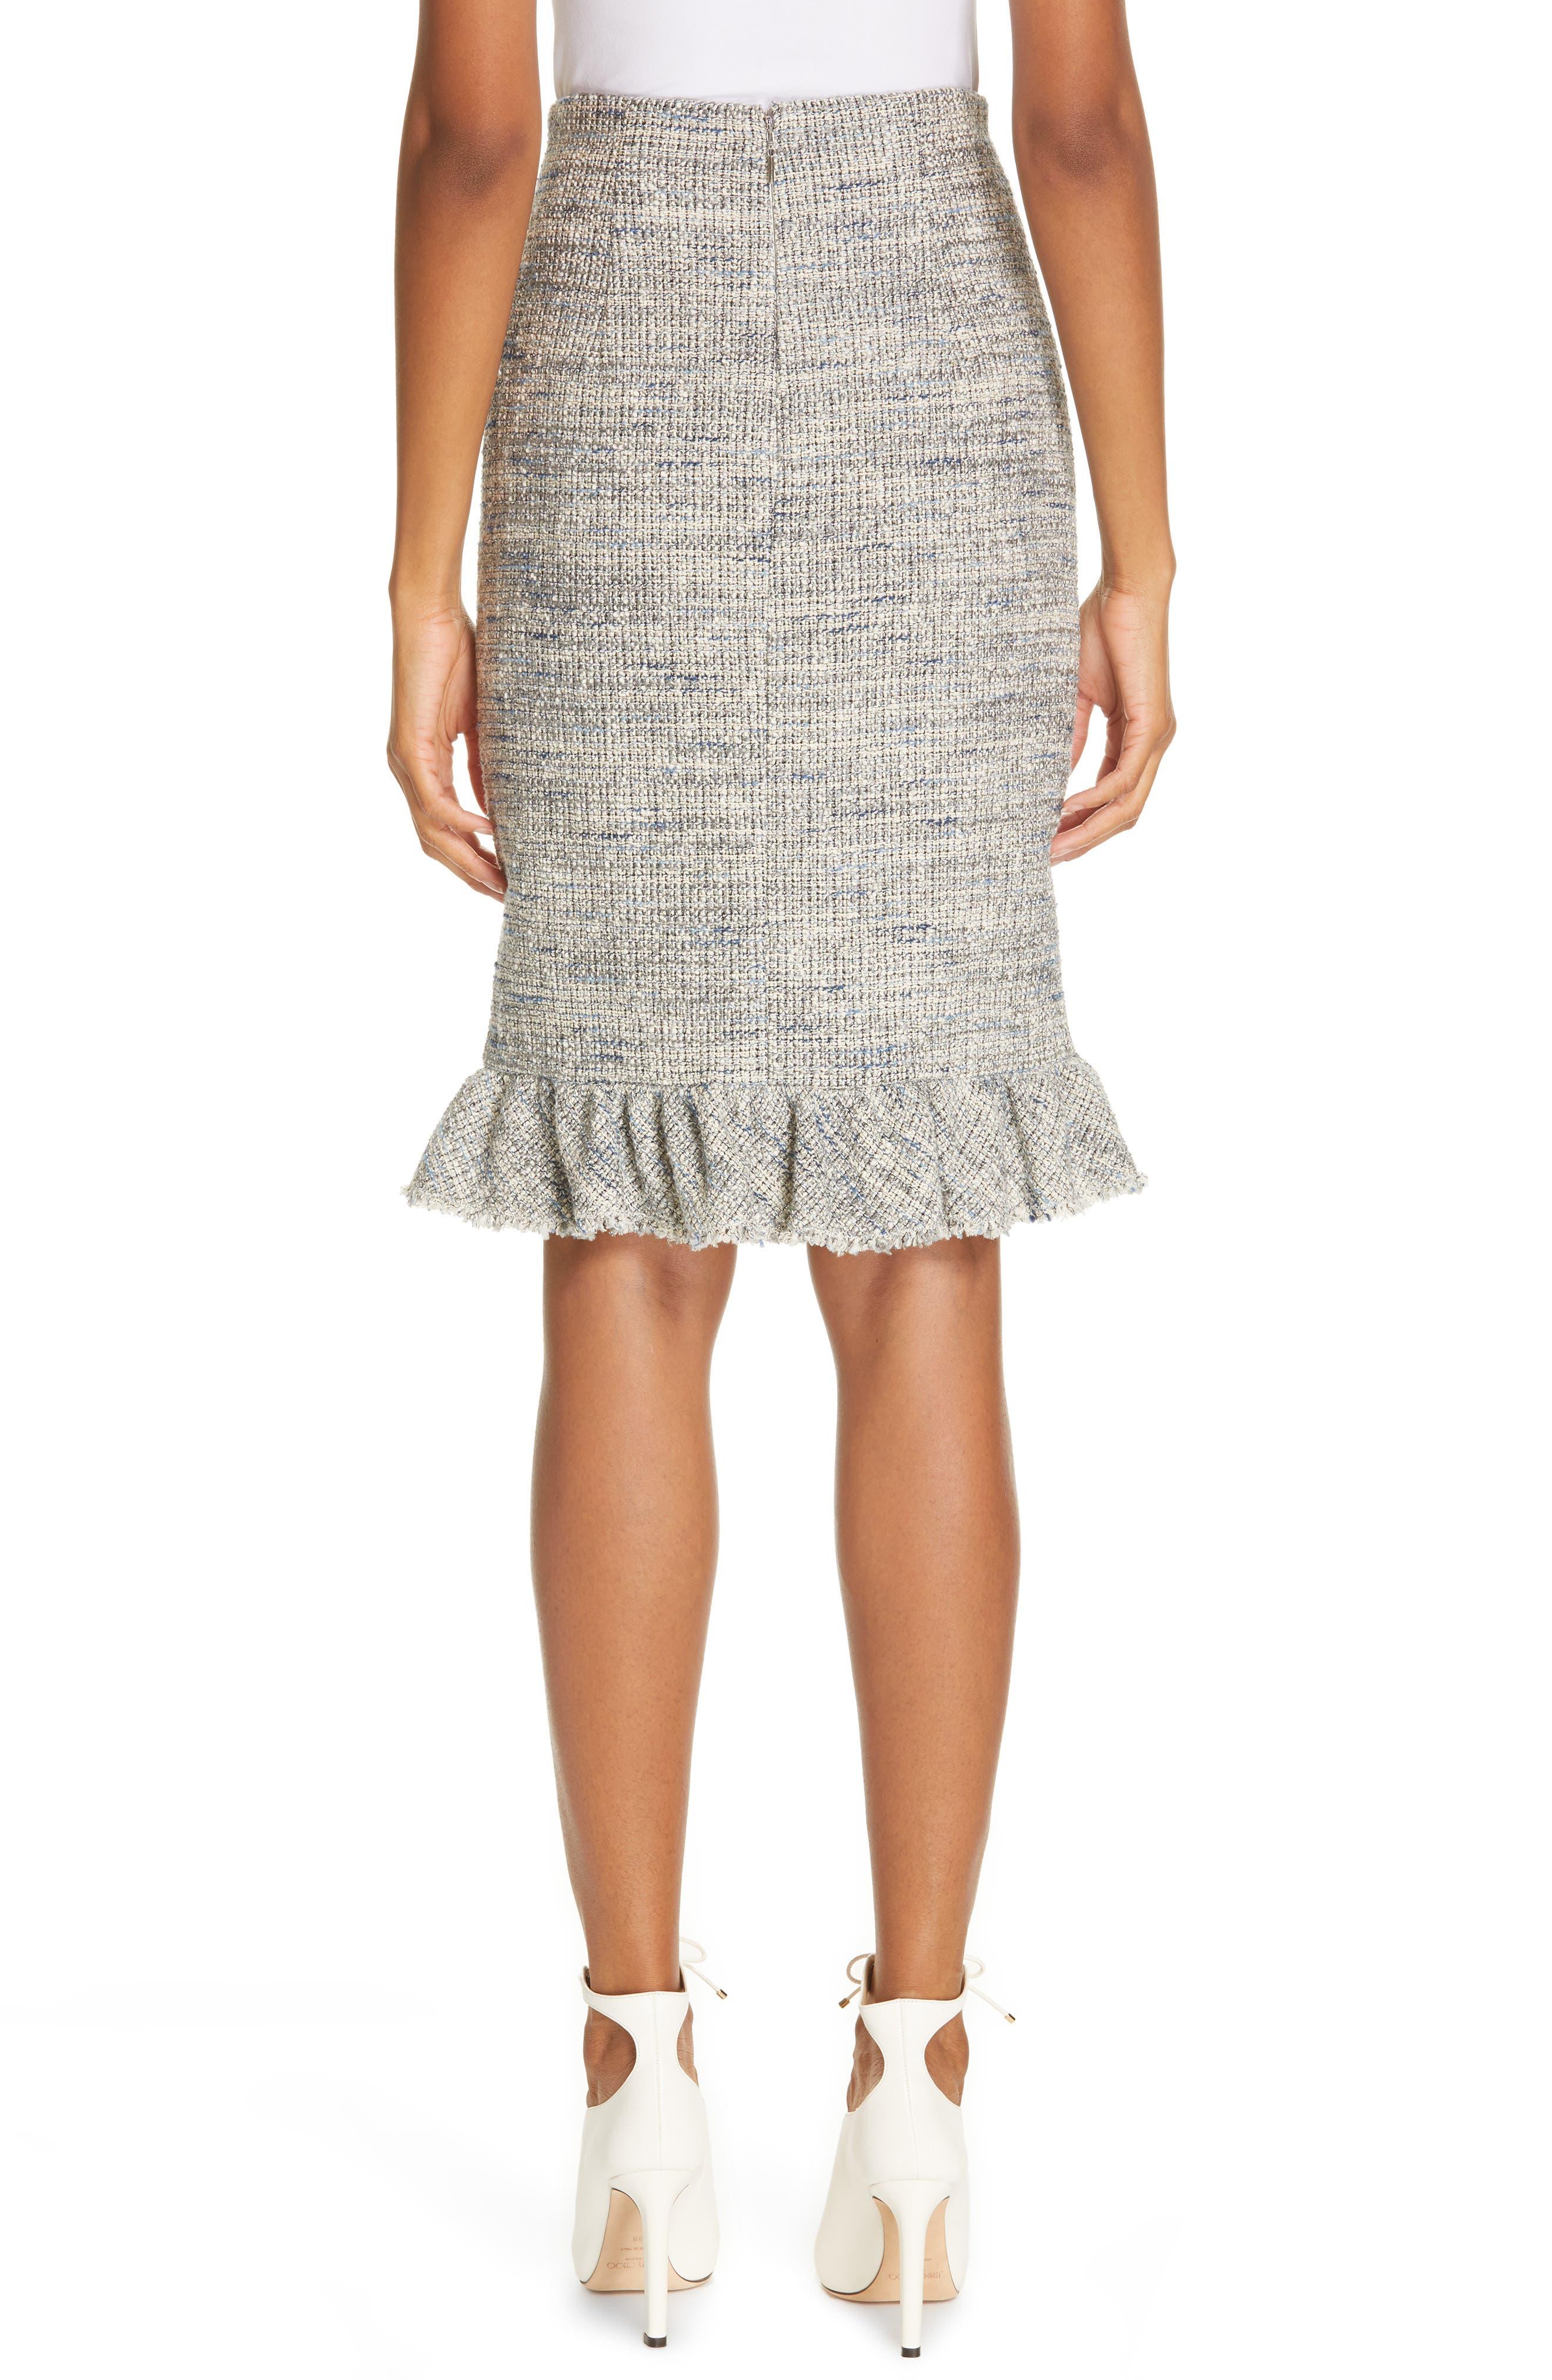 REBECCA TAYLOR, Tweed Ruffle Hem Skirt, Alternate thumbnail 2, color, 020